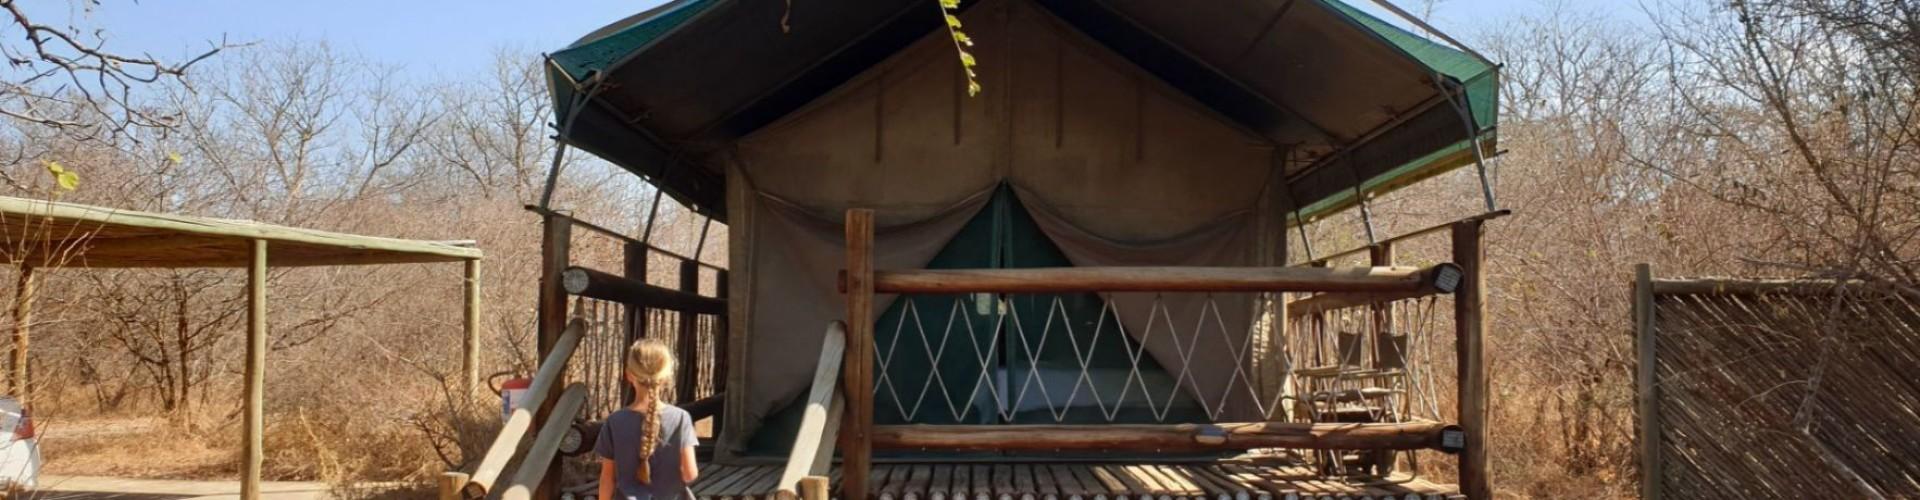 Kindvriendelijke hotels Zuid-Afrika